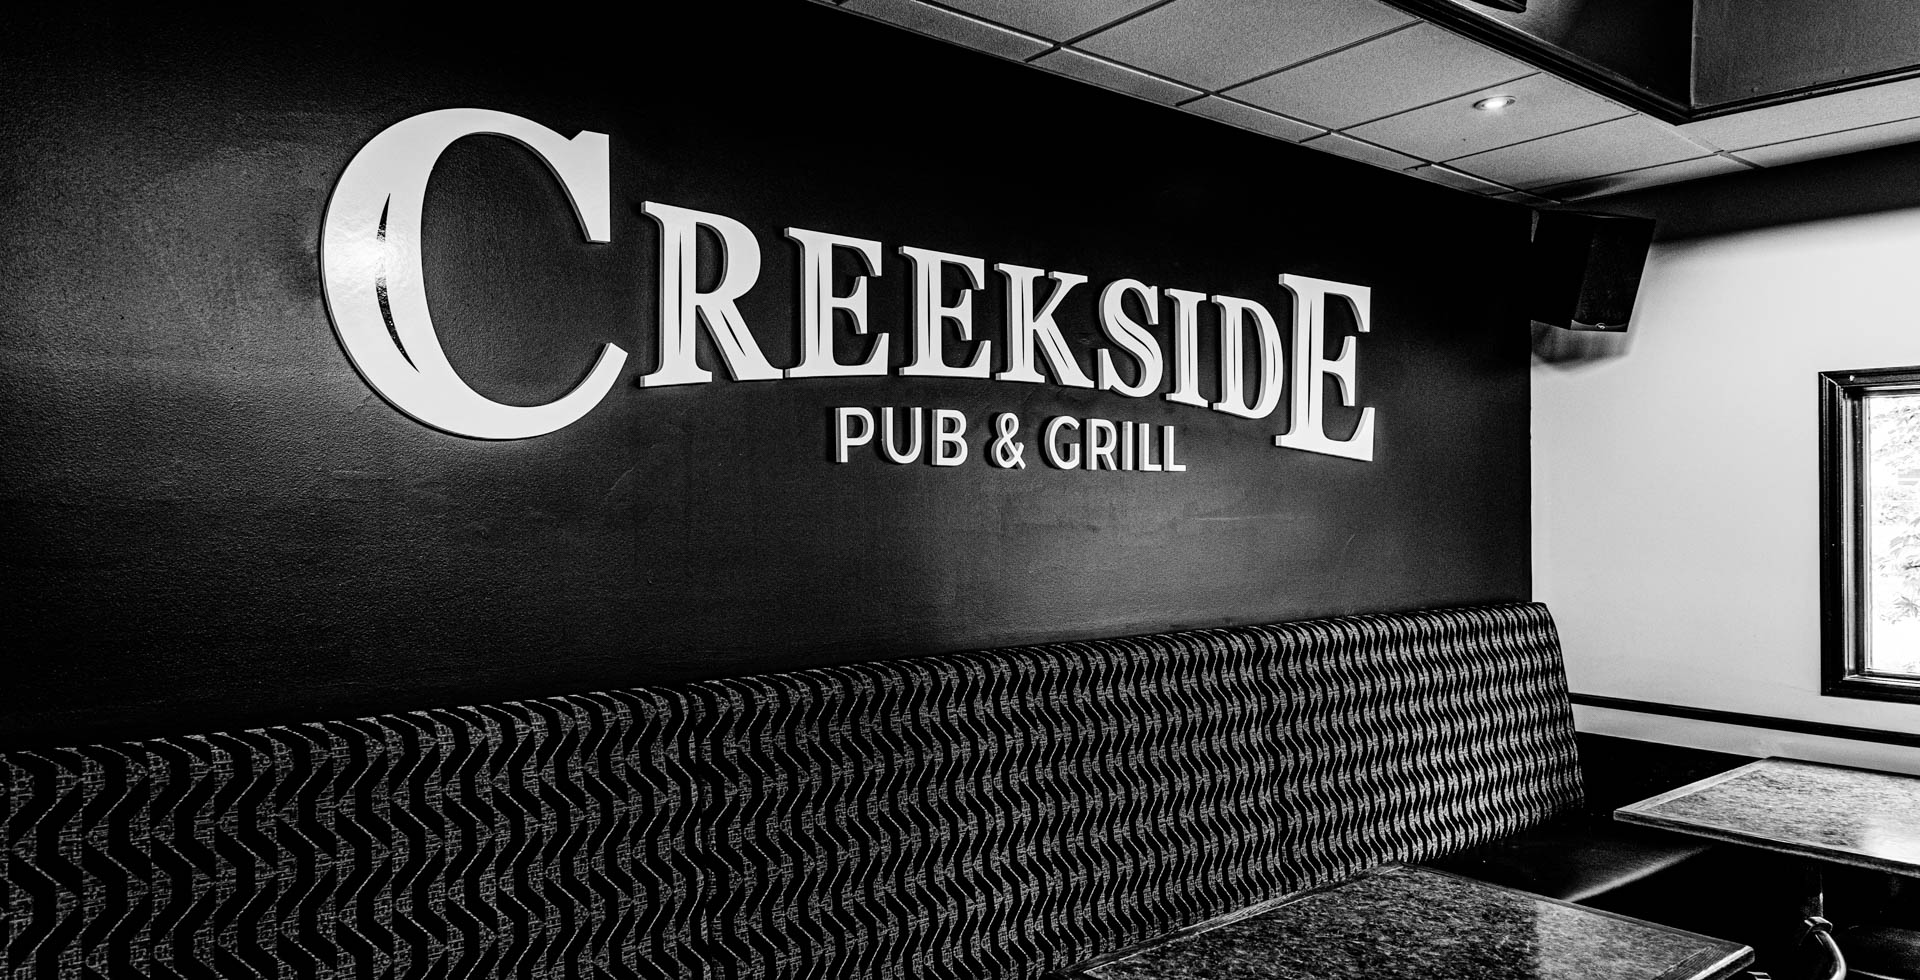 Creekside Pub and Grill Interior BW